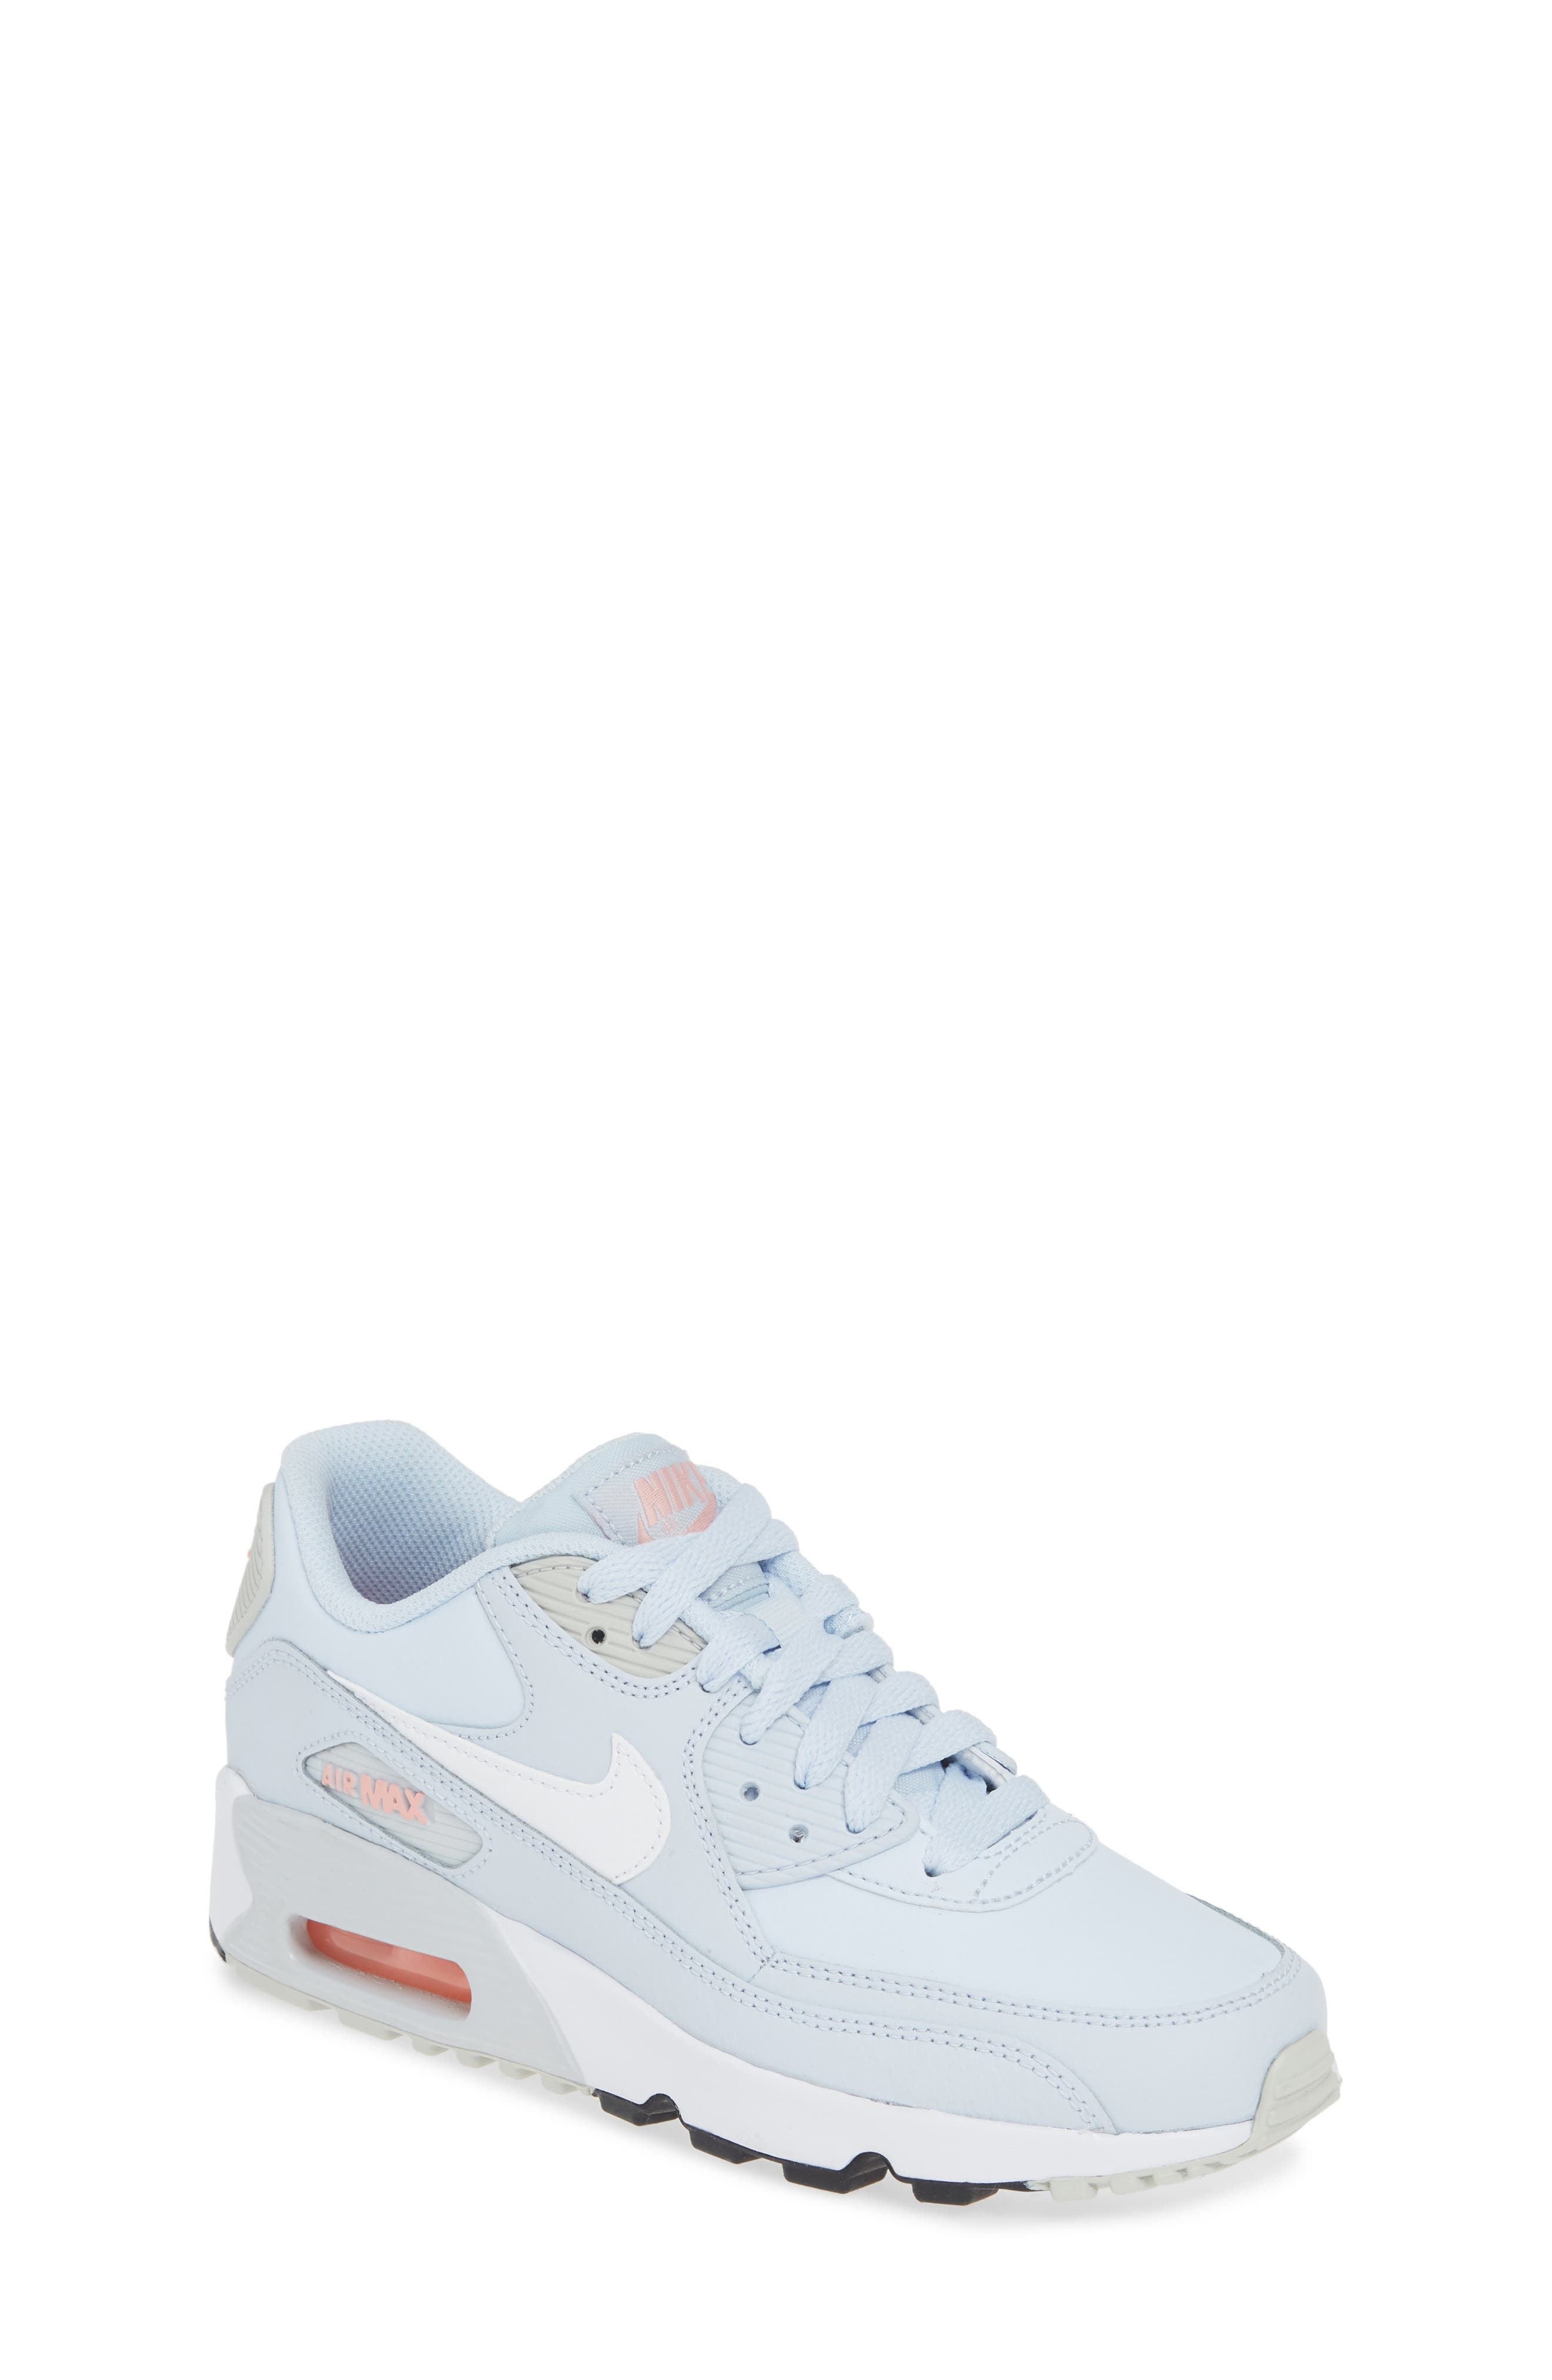 aa8dfdb14ed7 Girls  Nike Shoes